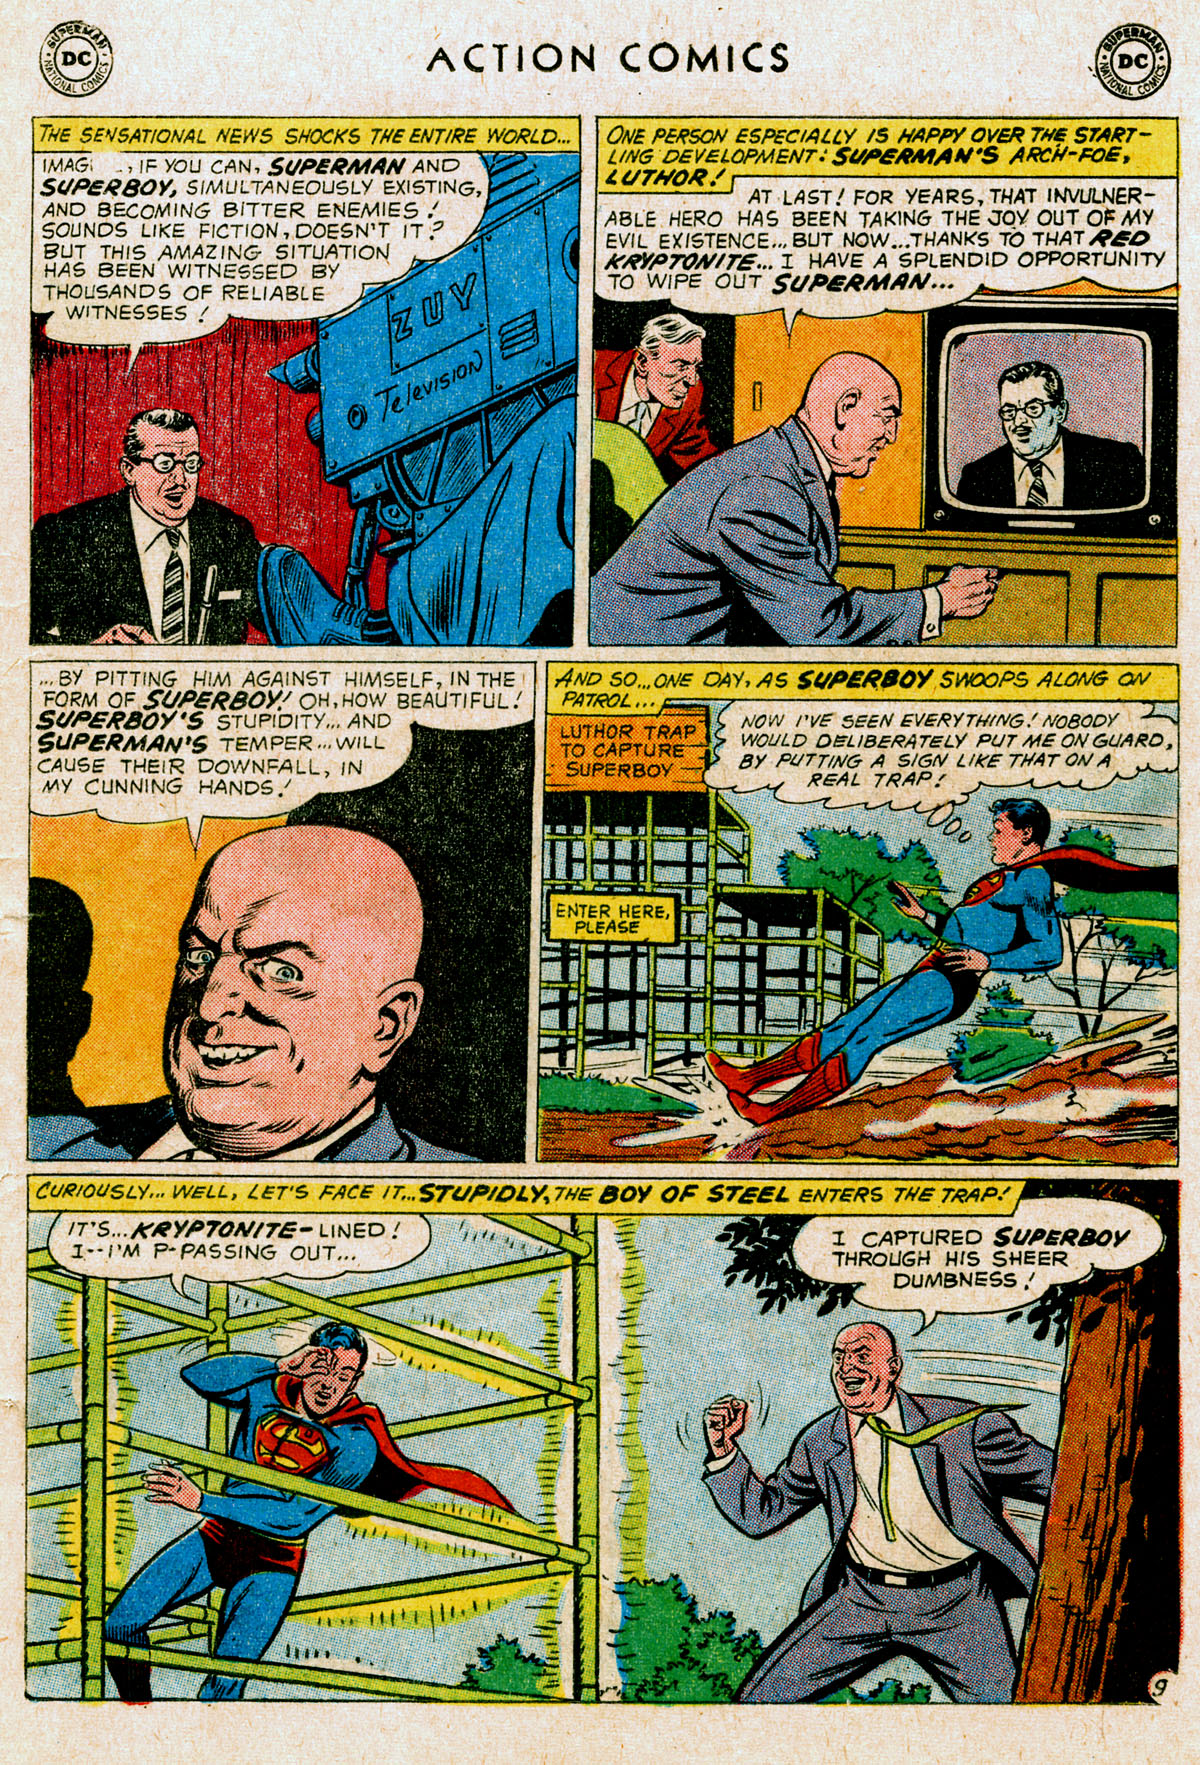 Action Comics (1938) 259 Page 10